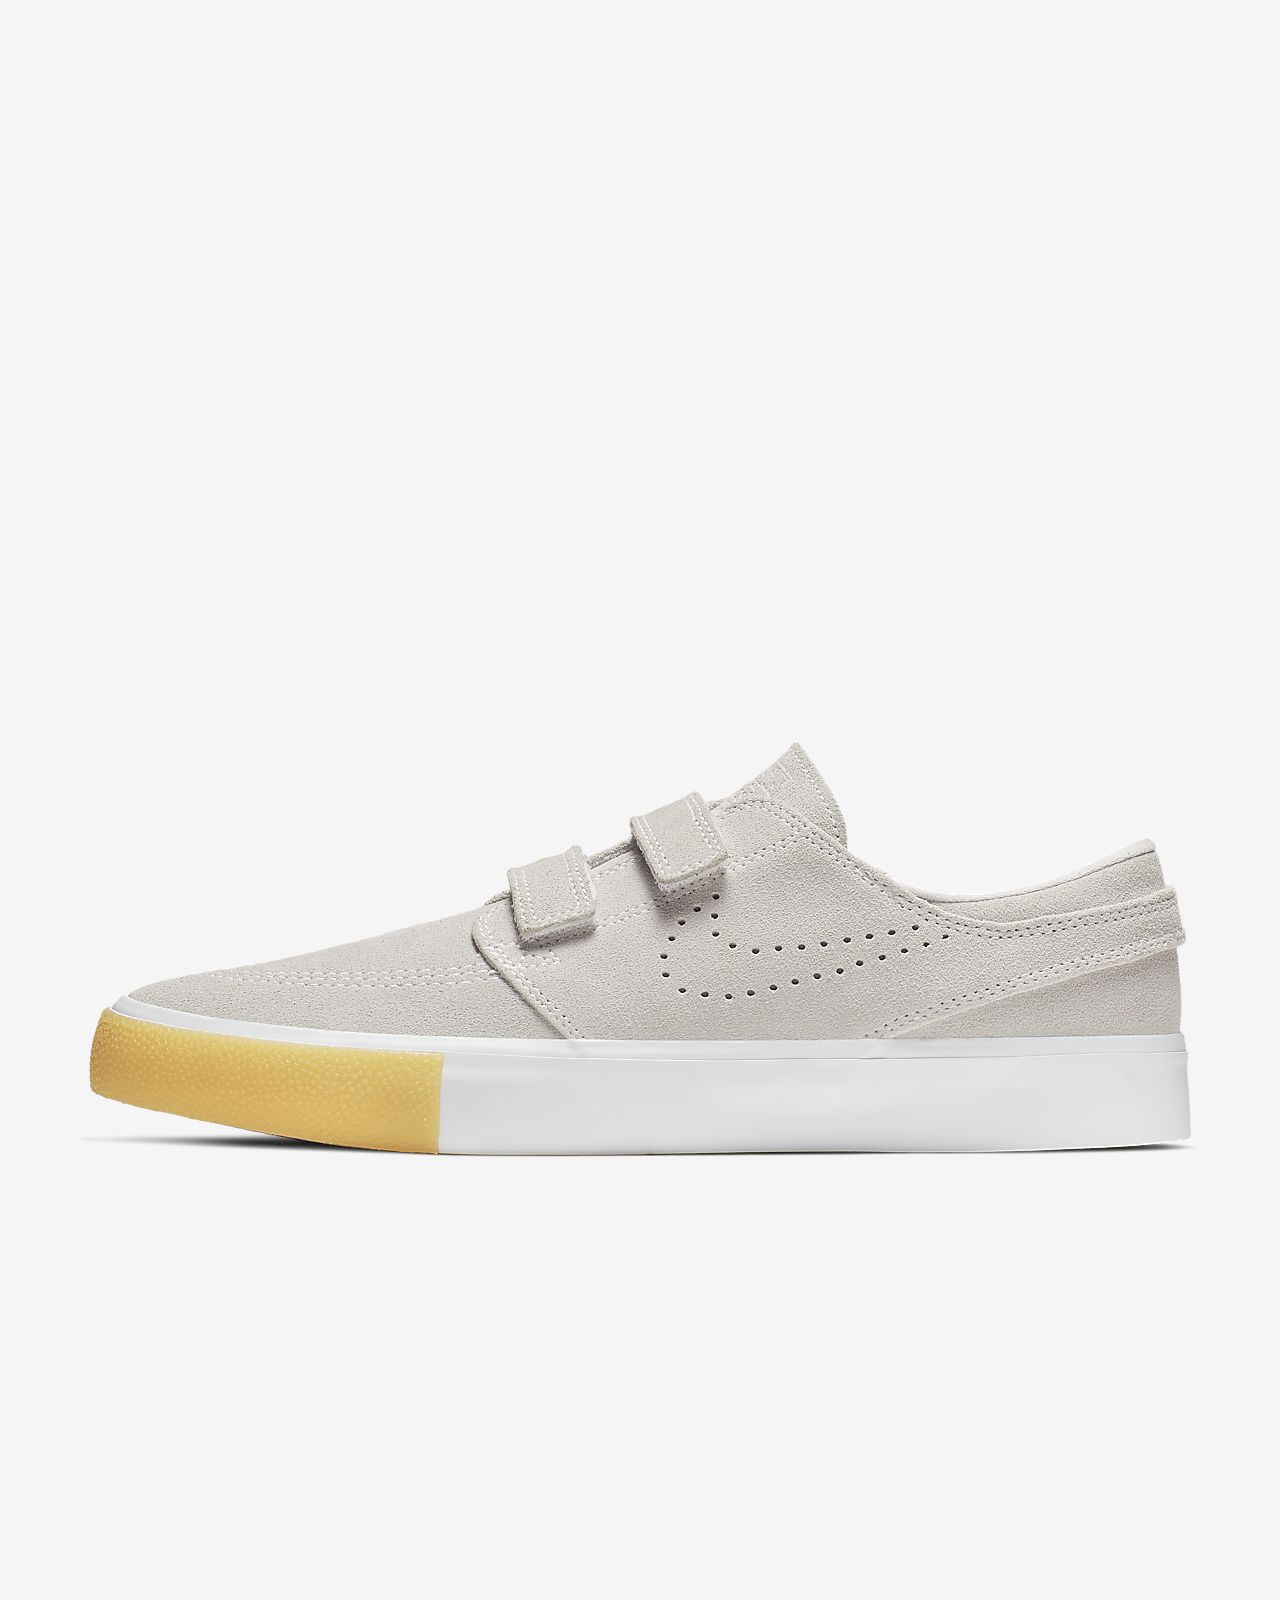 Nike SB Zoom Stefan Janoski AC RM SE Skate Shoe